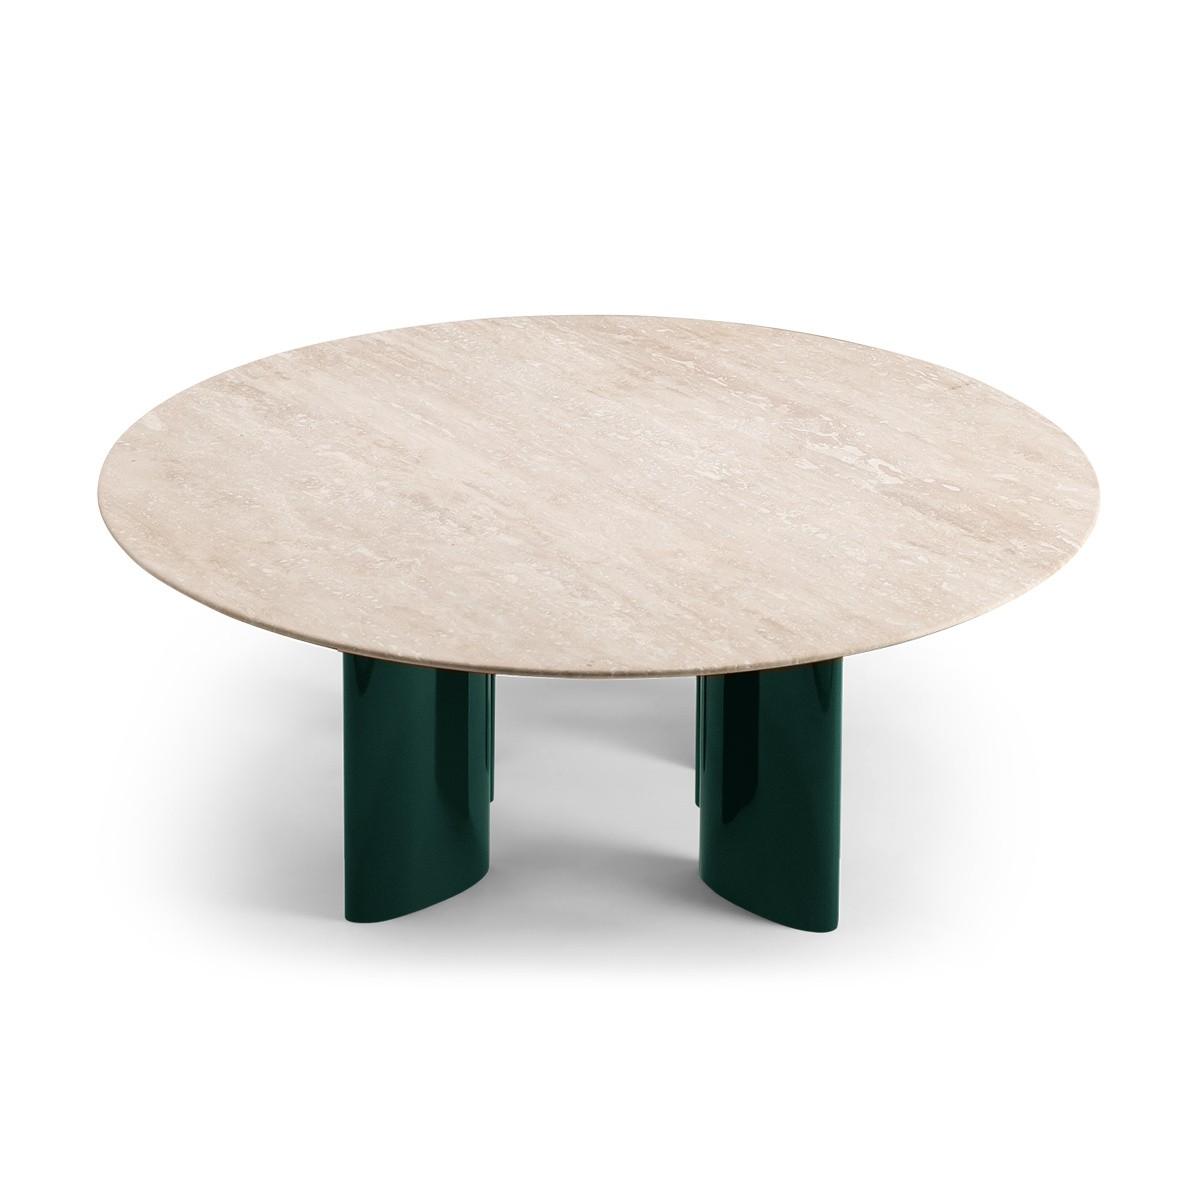 Table basse Carlotta pieds laques vert et travertin